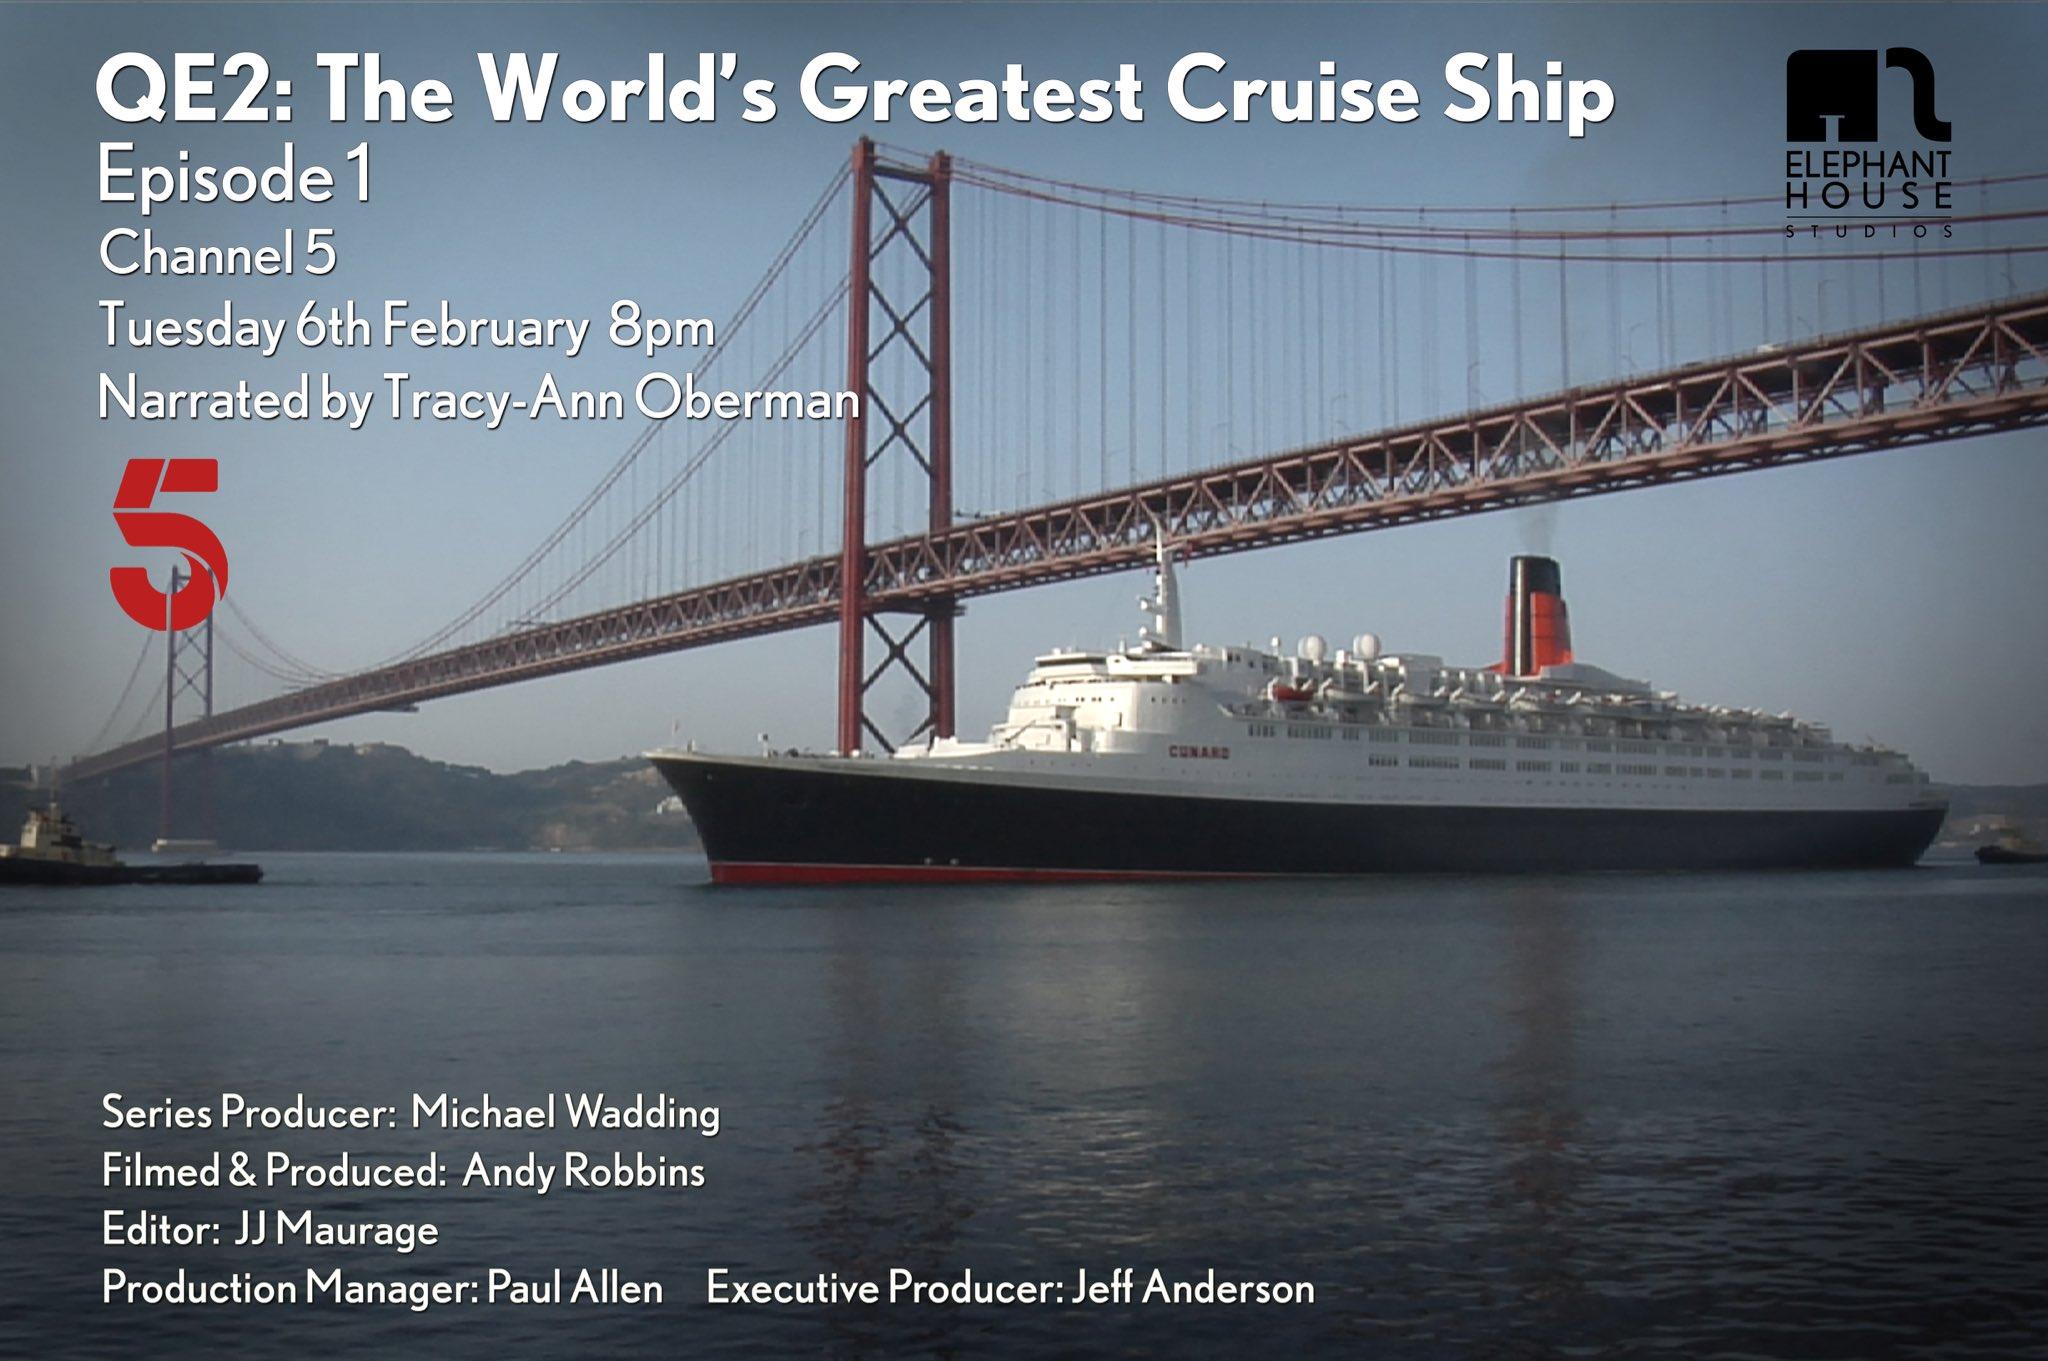 QE2: The World's Greatest Cruise Ship